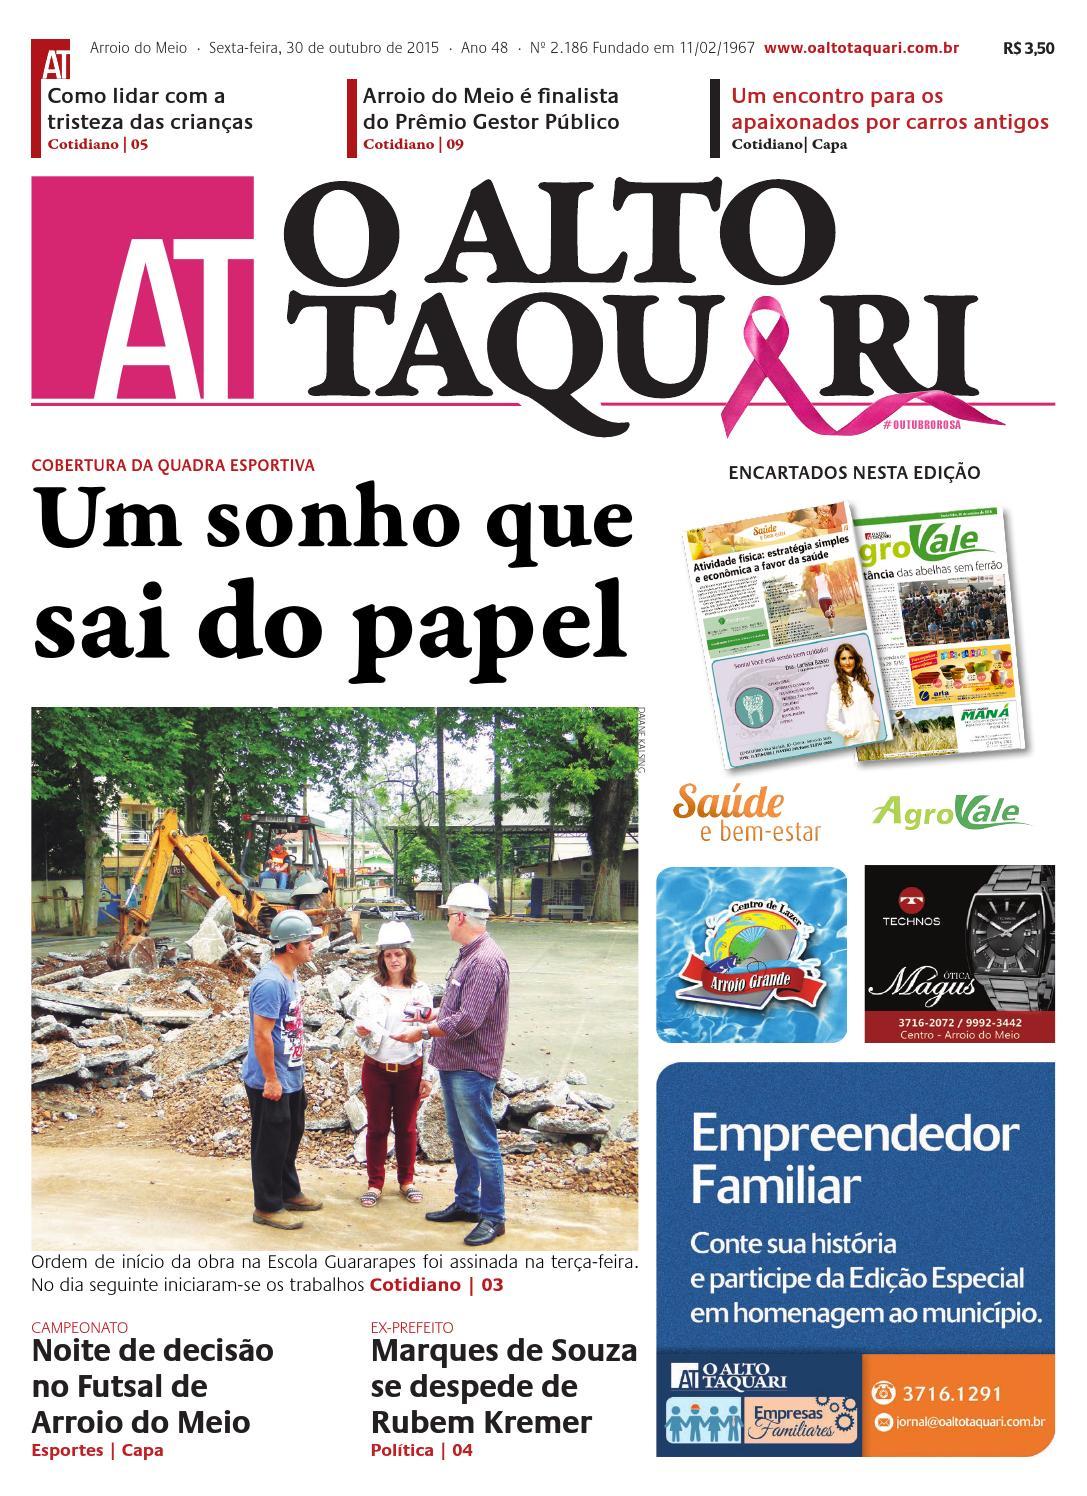 Jornal O Alto Taquari - 30 de outubro de 2015 by Jornal O Alto Taquari -  issuu 42899cff8d